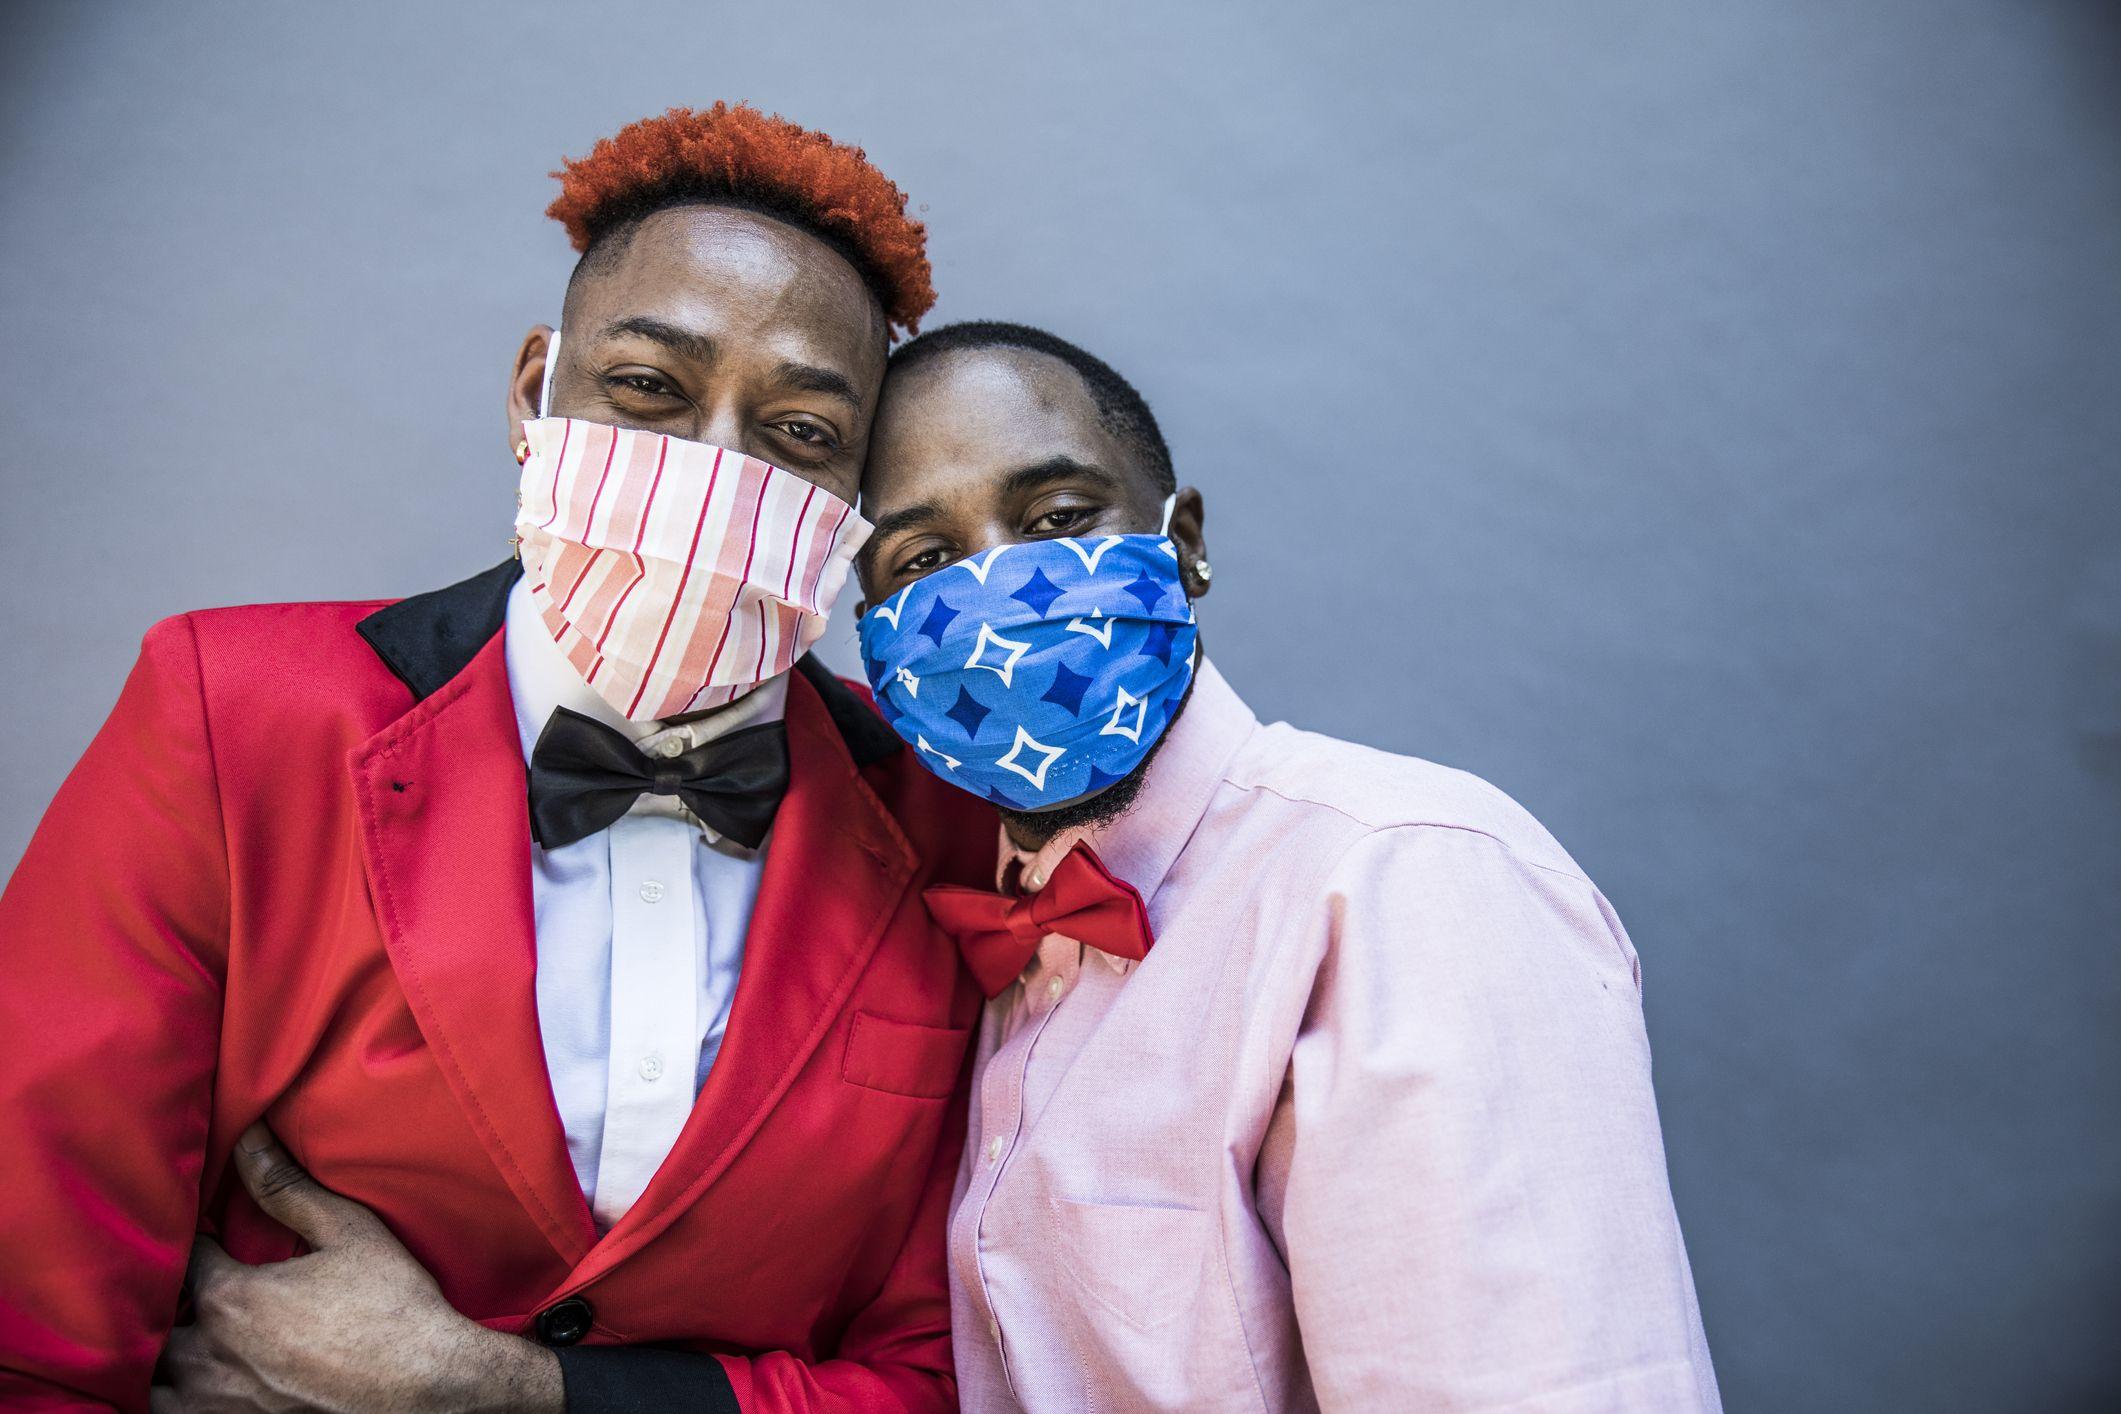 to svarte menn i masker og smoking